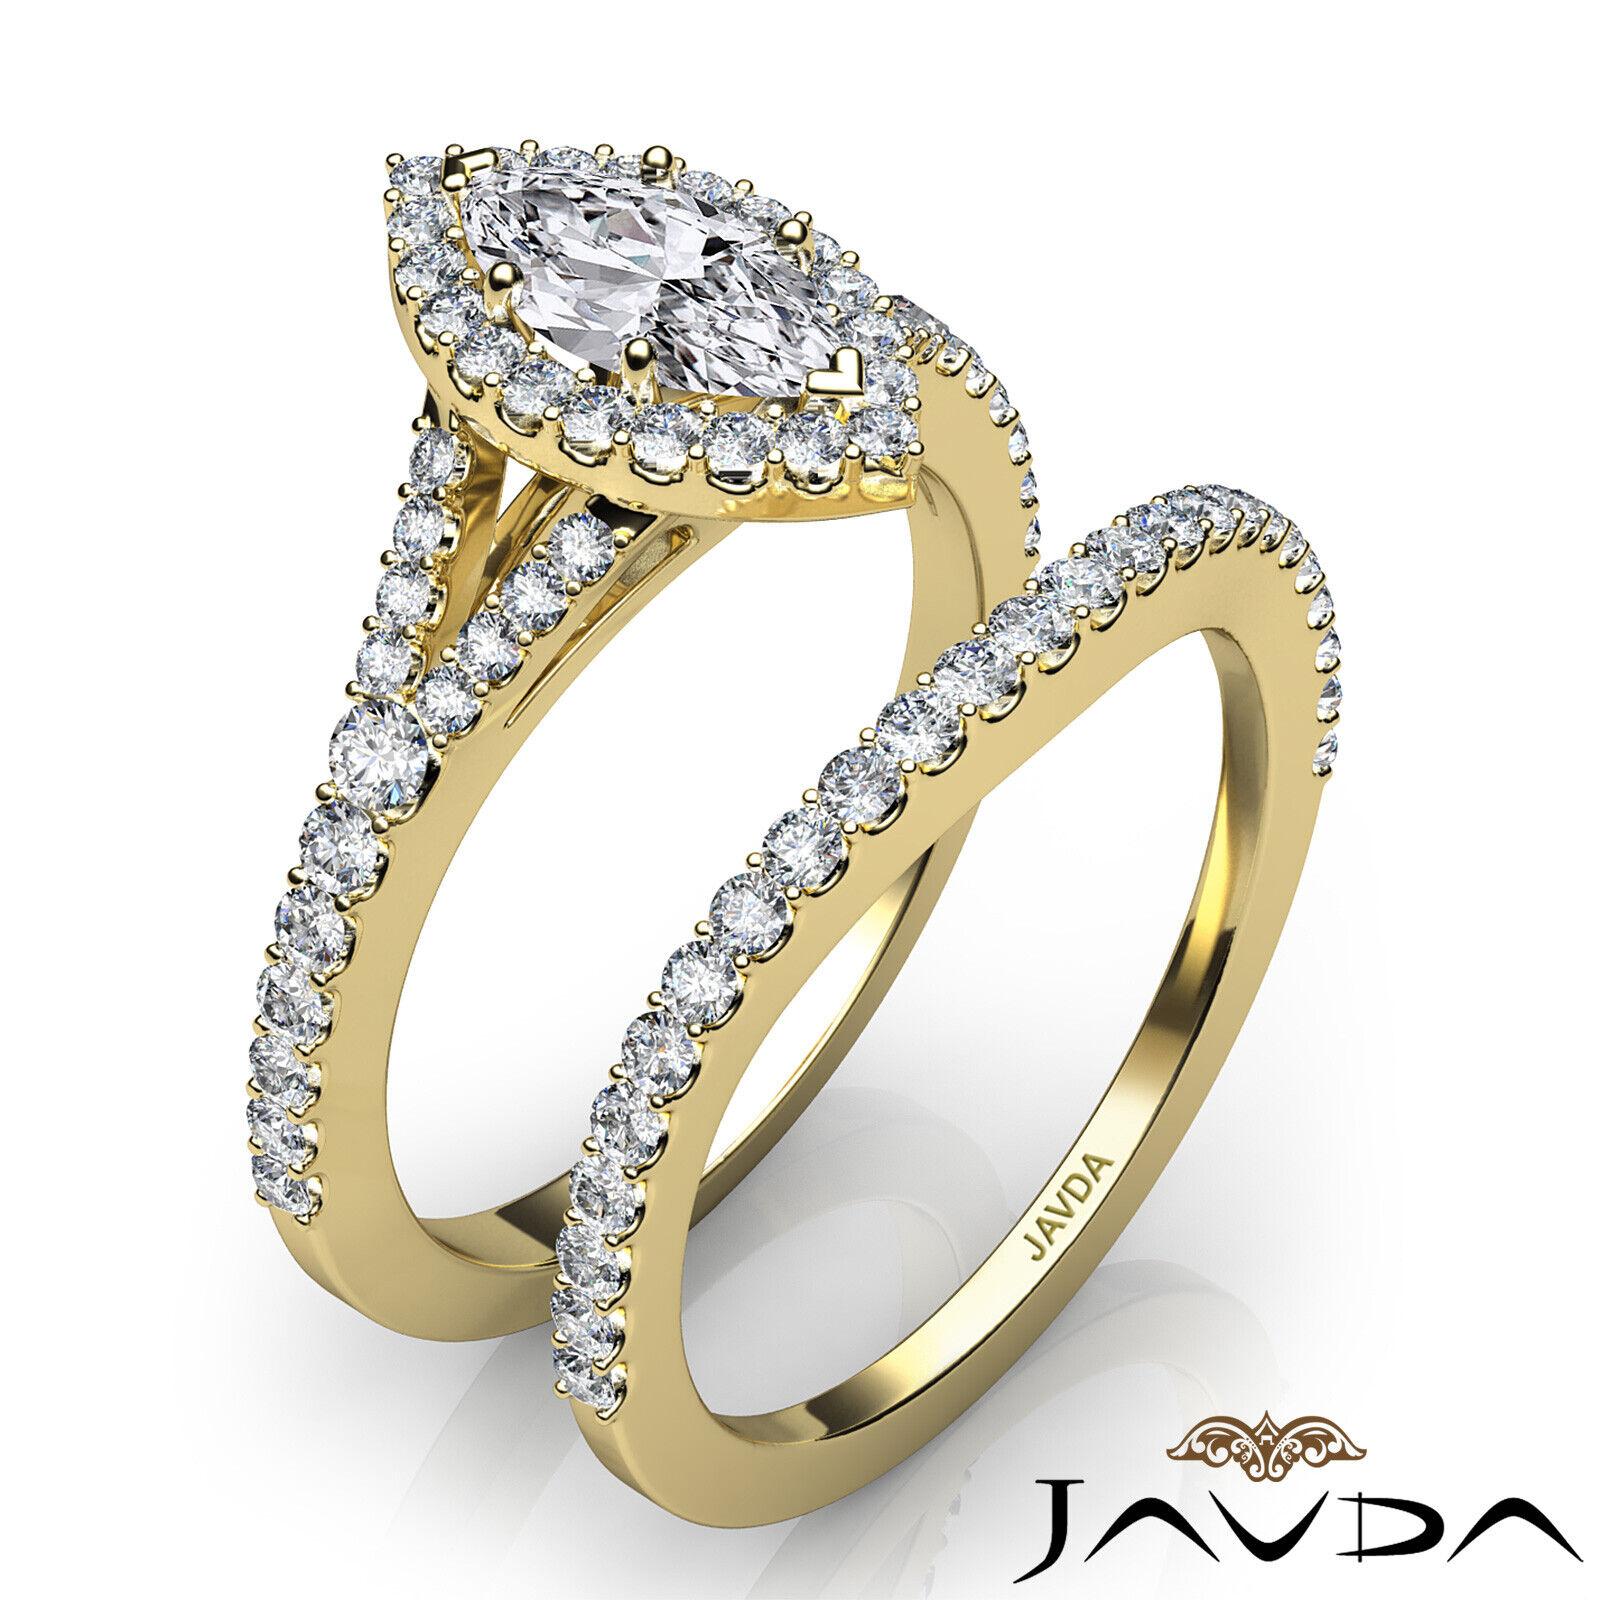 2.02ctw Halo Bridal Set Split Shank Marquise Diamond Engagement Ring GIA F-SI1 10